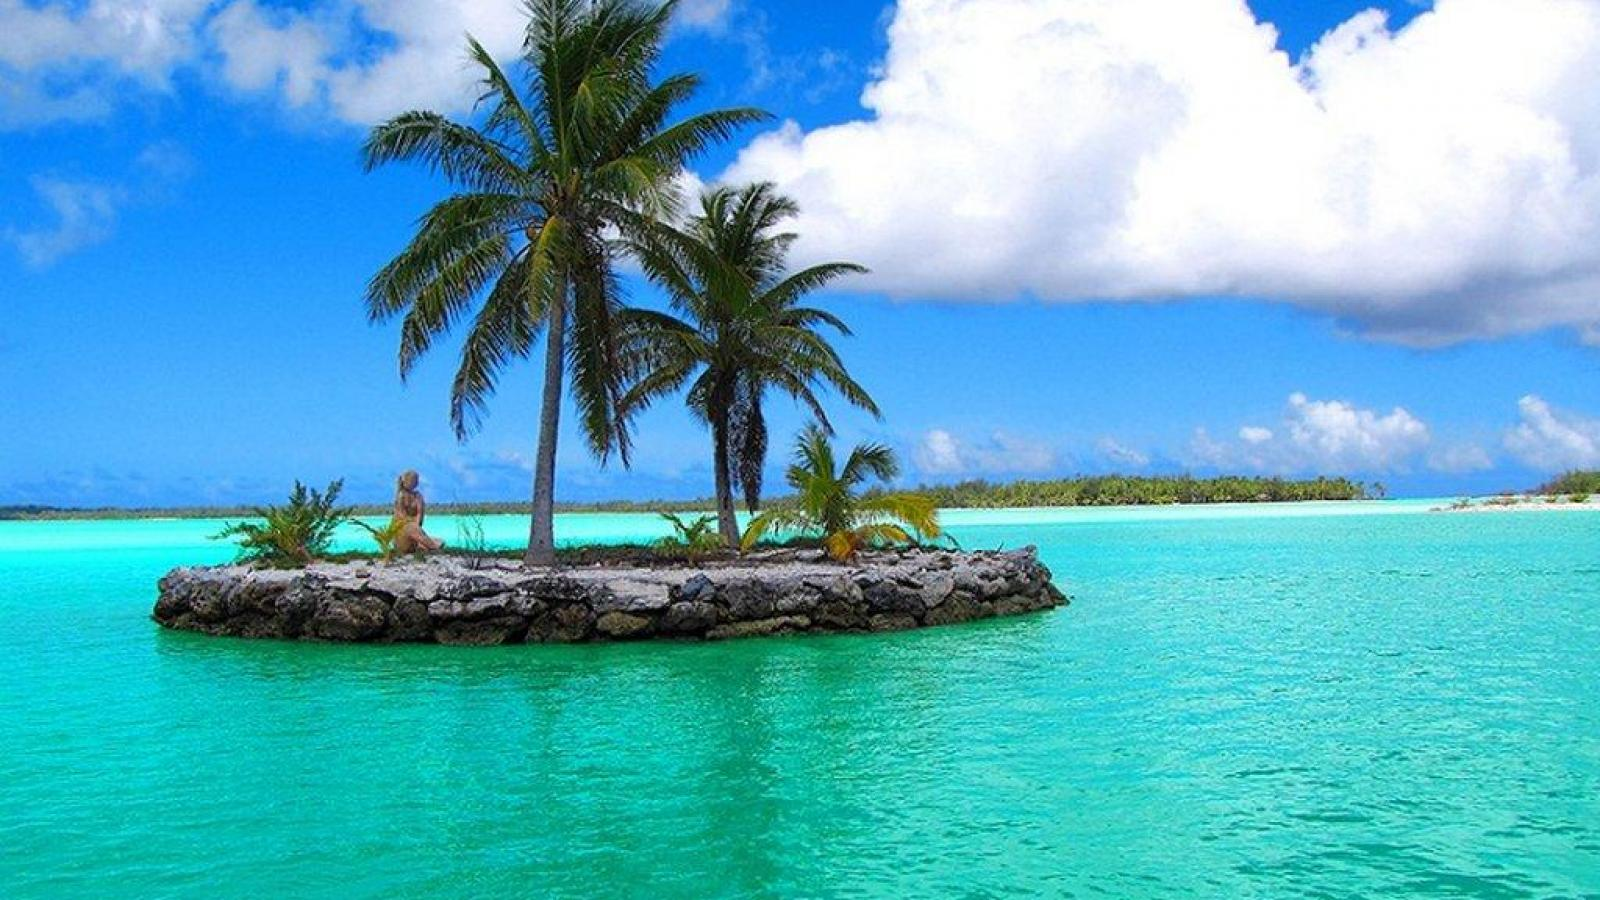 Bora Bora Widescreen Wallpaper Travel HD